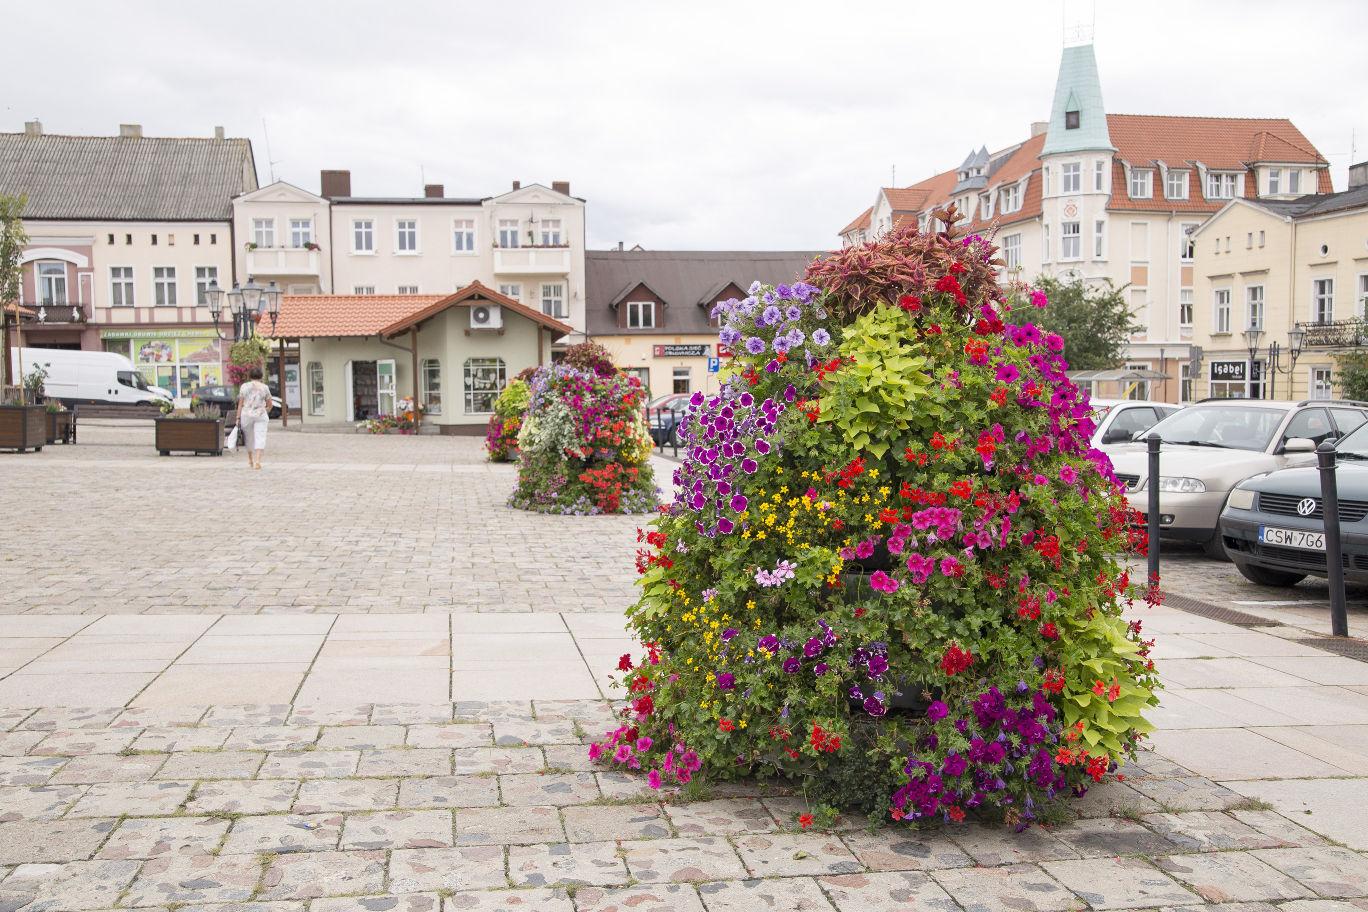 jak ukwiecić rynek wieże kwiatowe terra